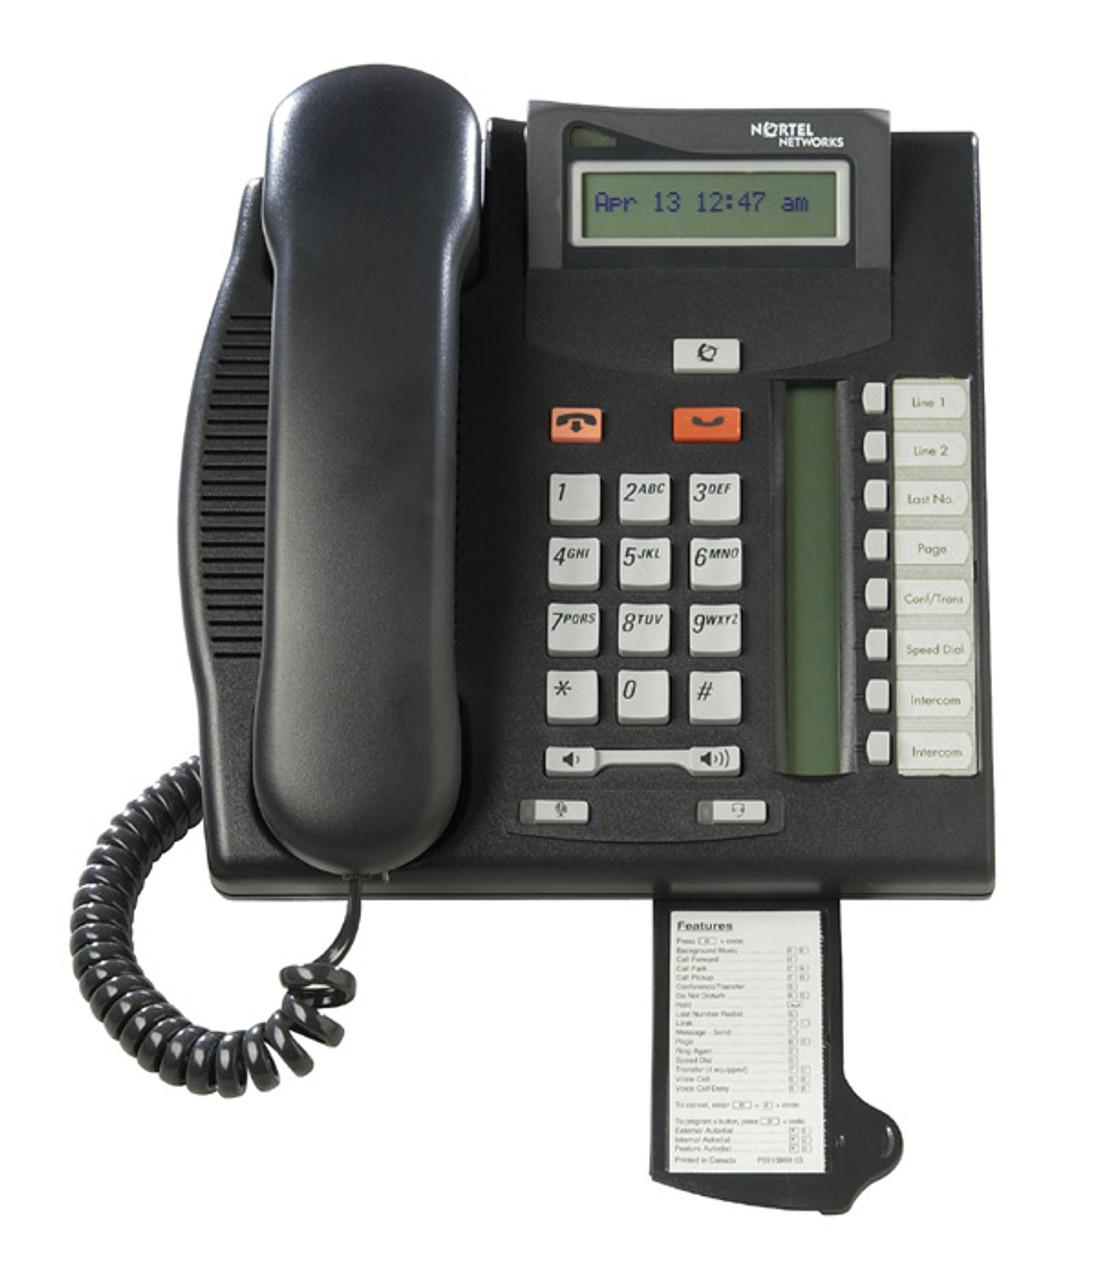 nortel norstar t7208 telephone [ 1097 x 1280 Pixel ]